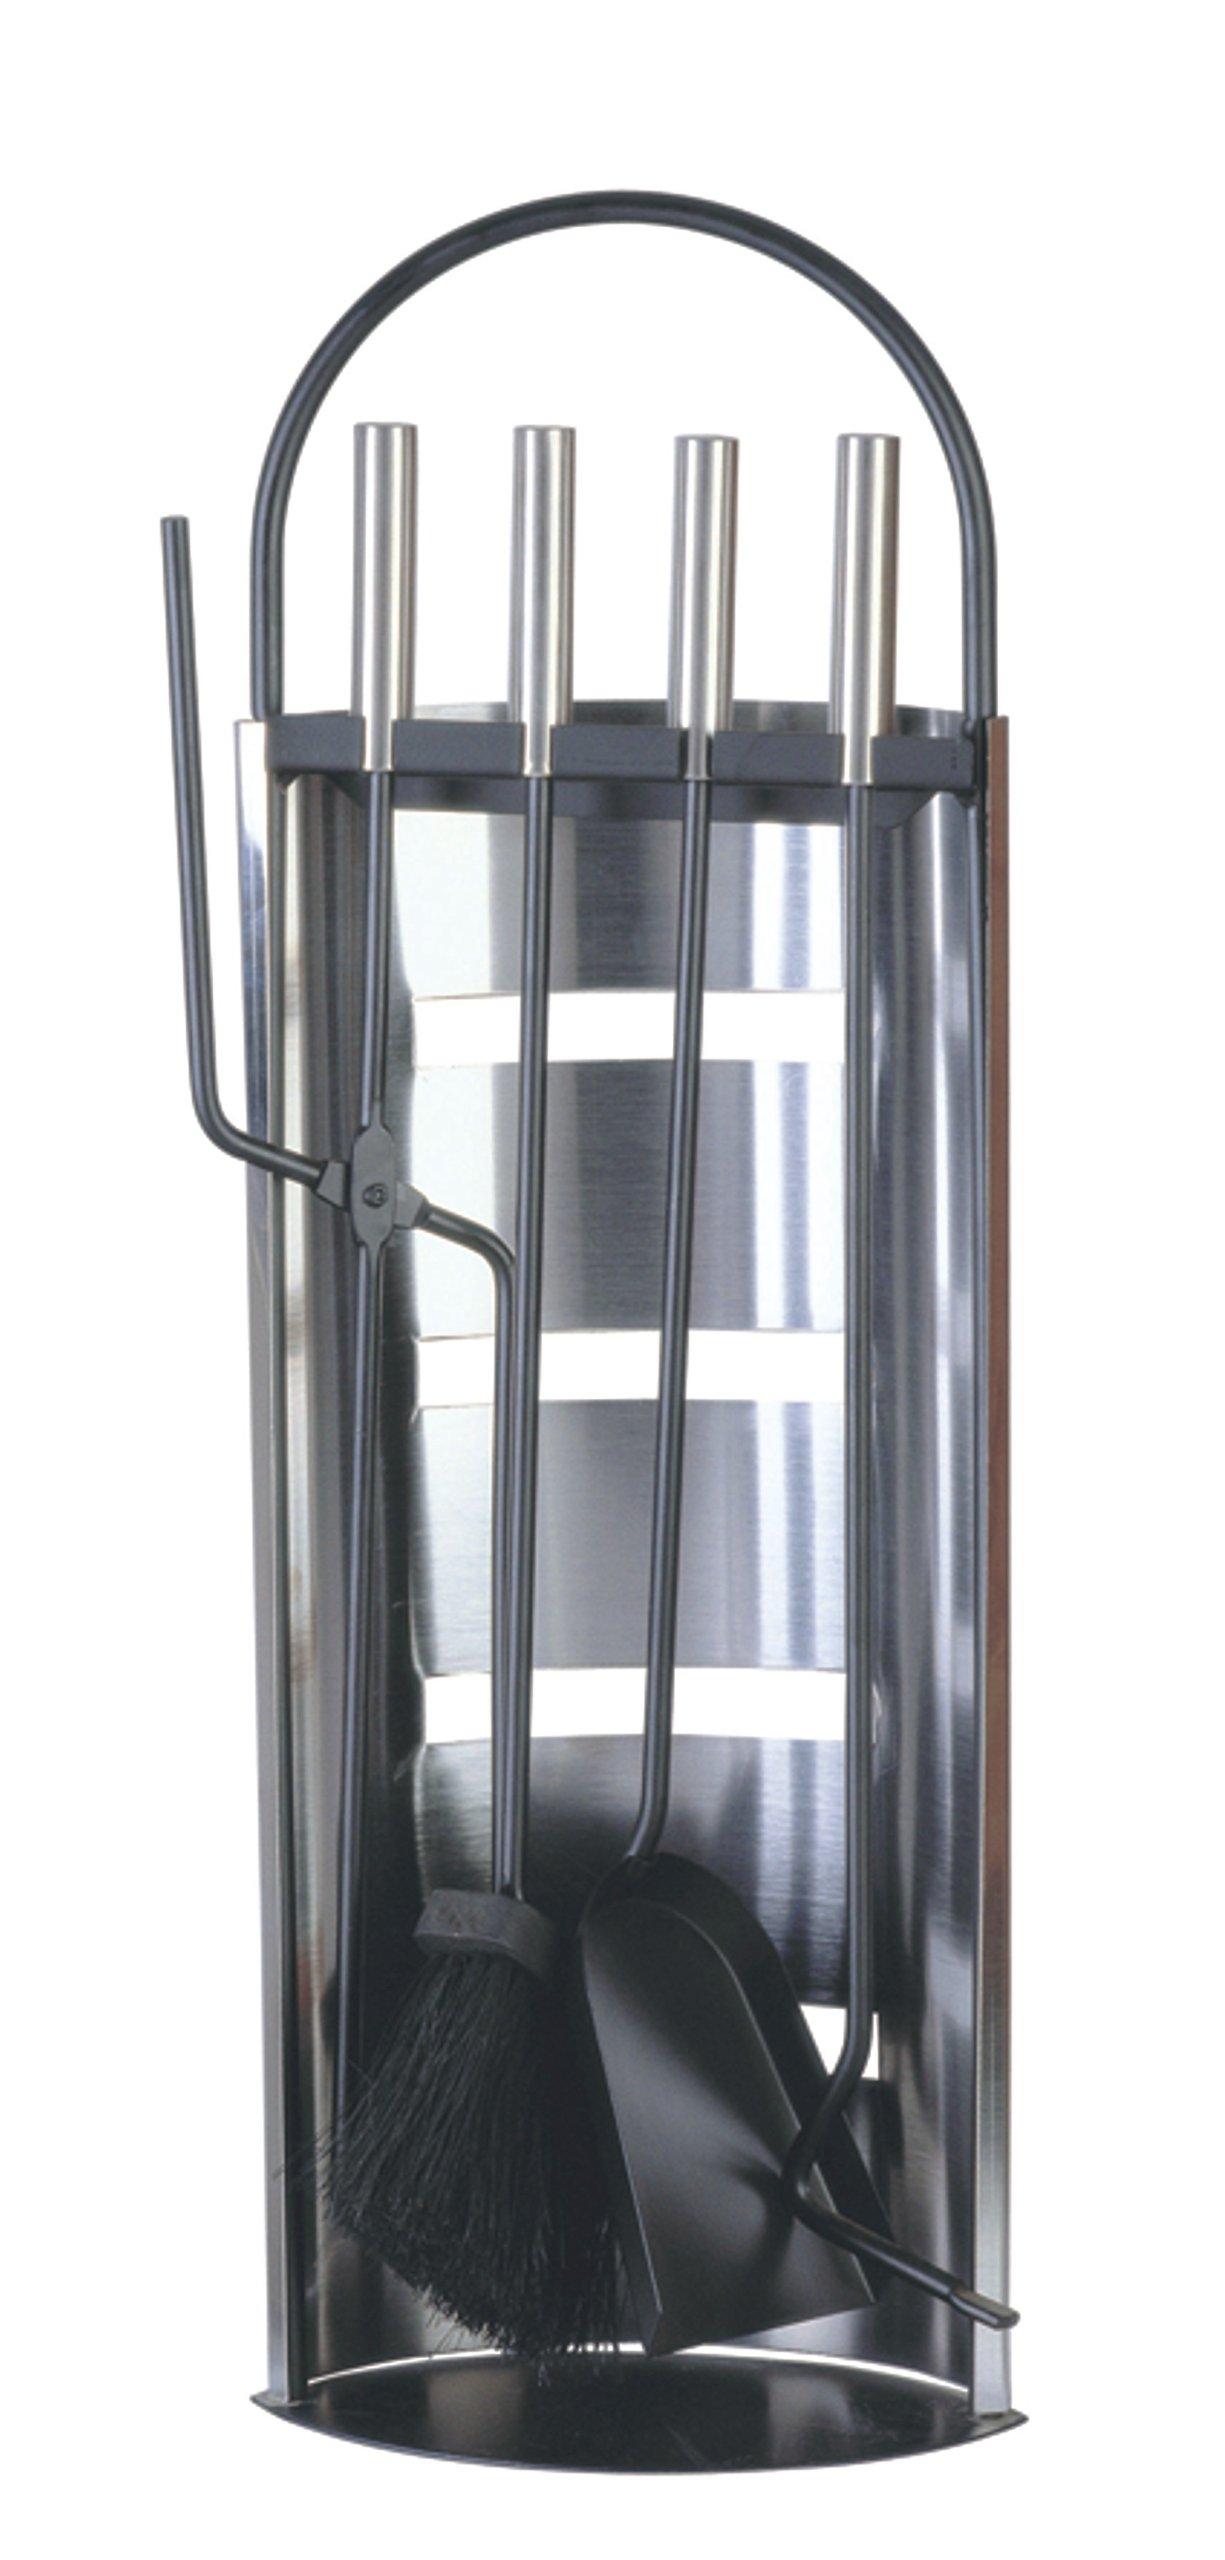 Benta 99001 – Utensilio de chimenea